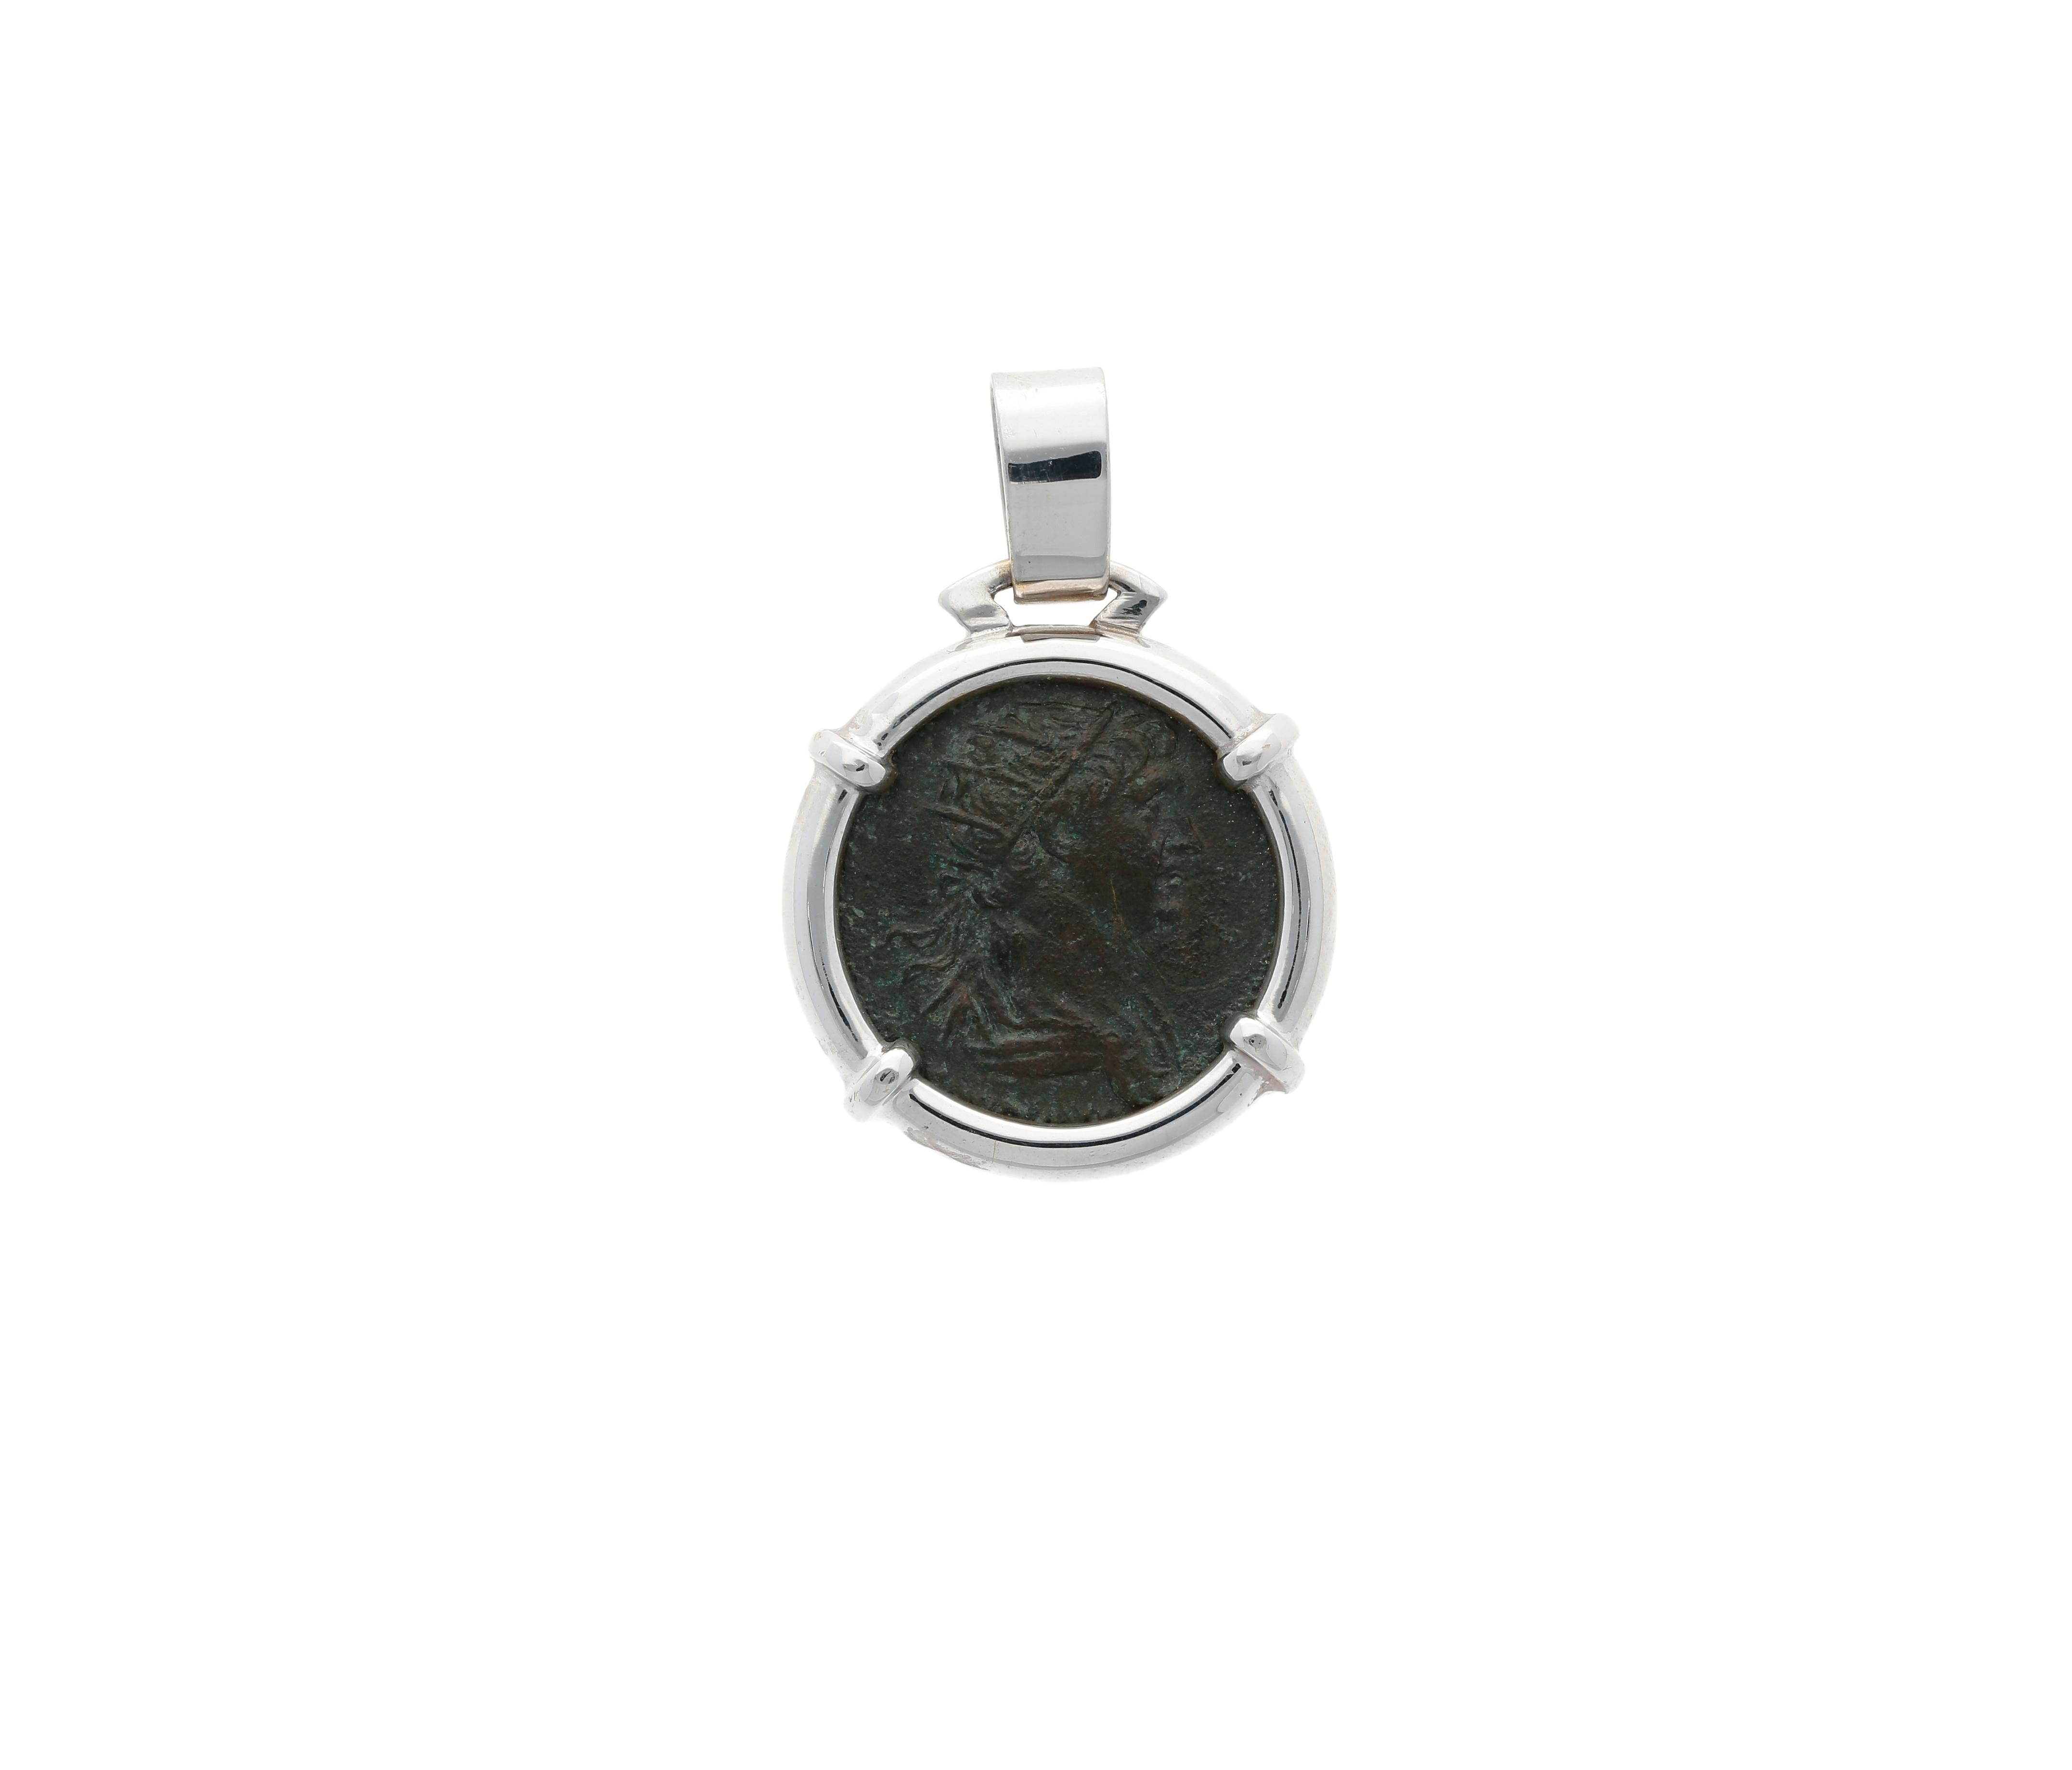 Roman Coin Emperor Nerva in 18 Kt White Gold pendant